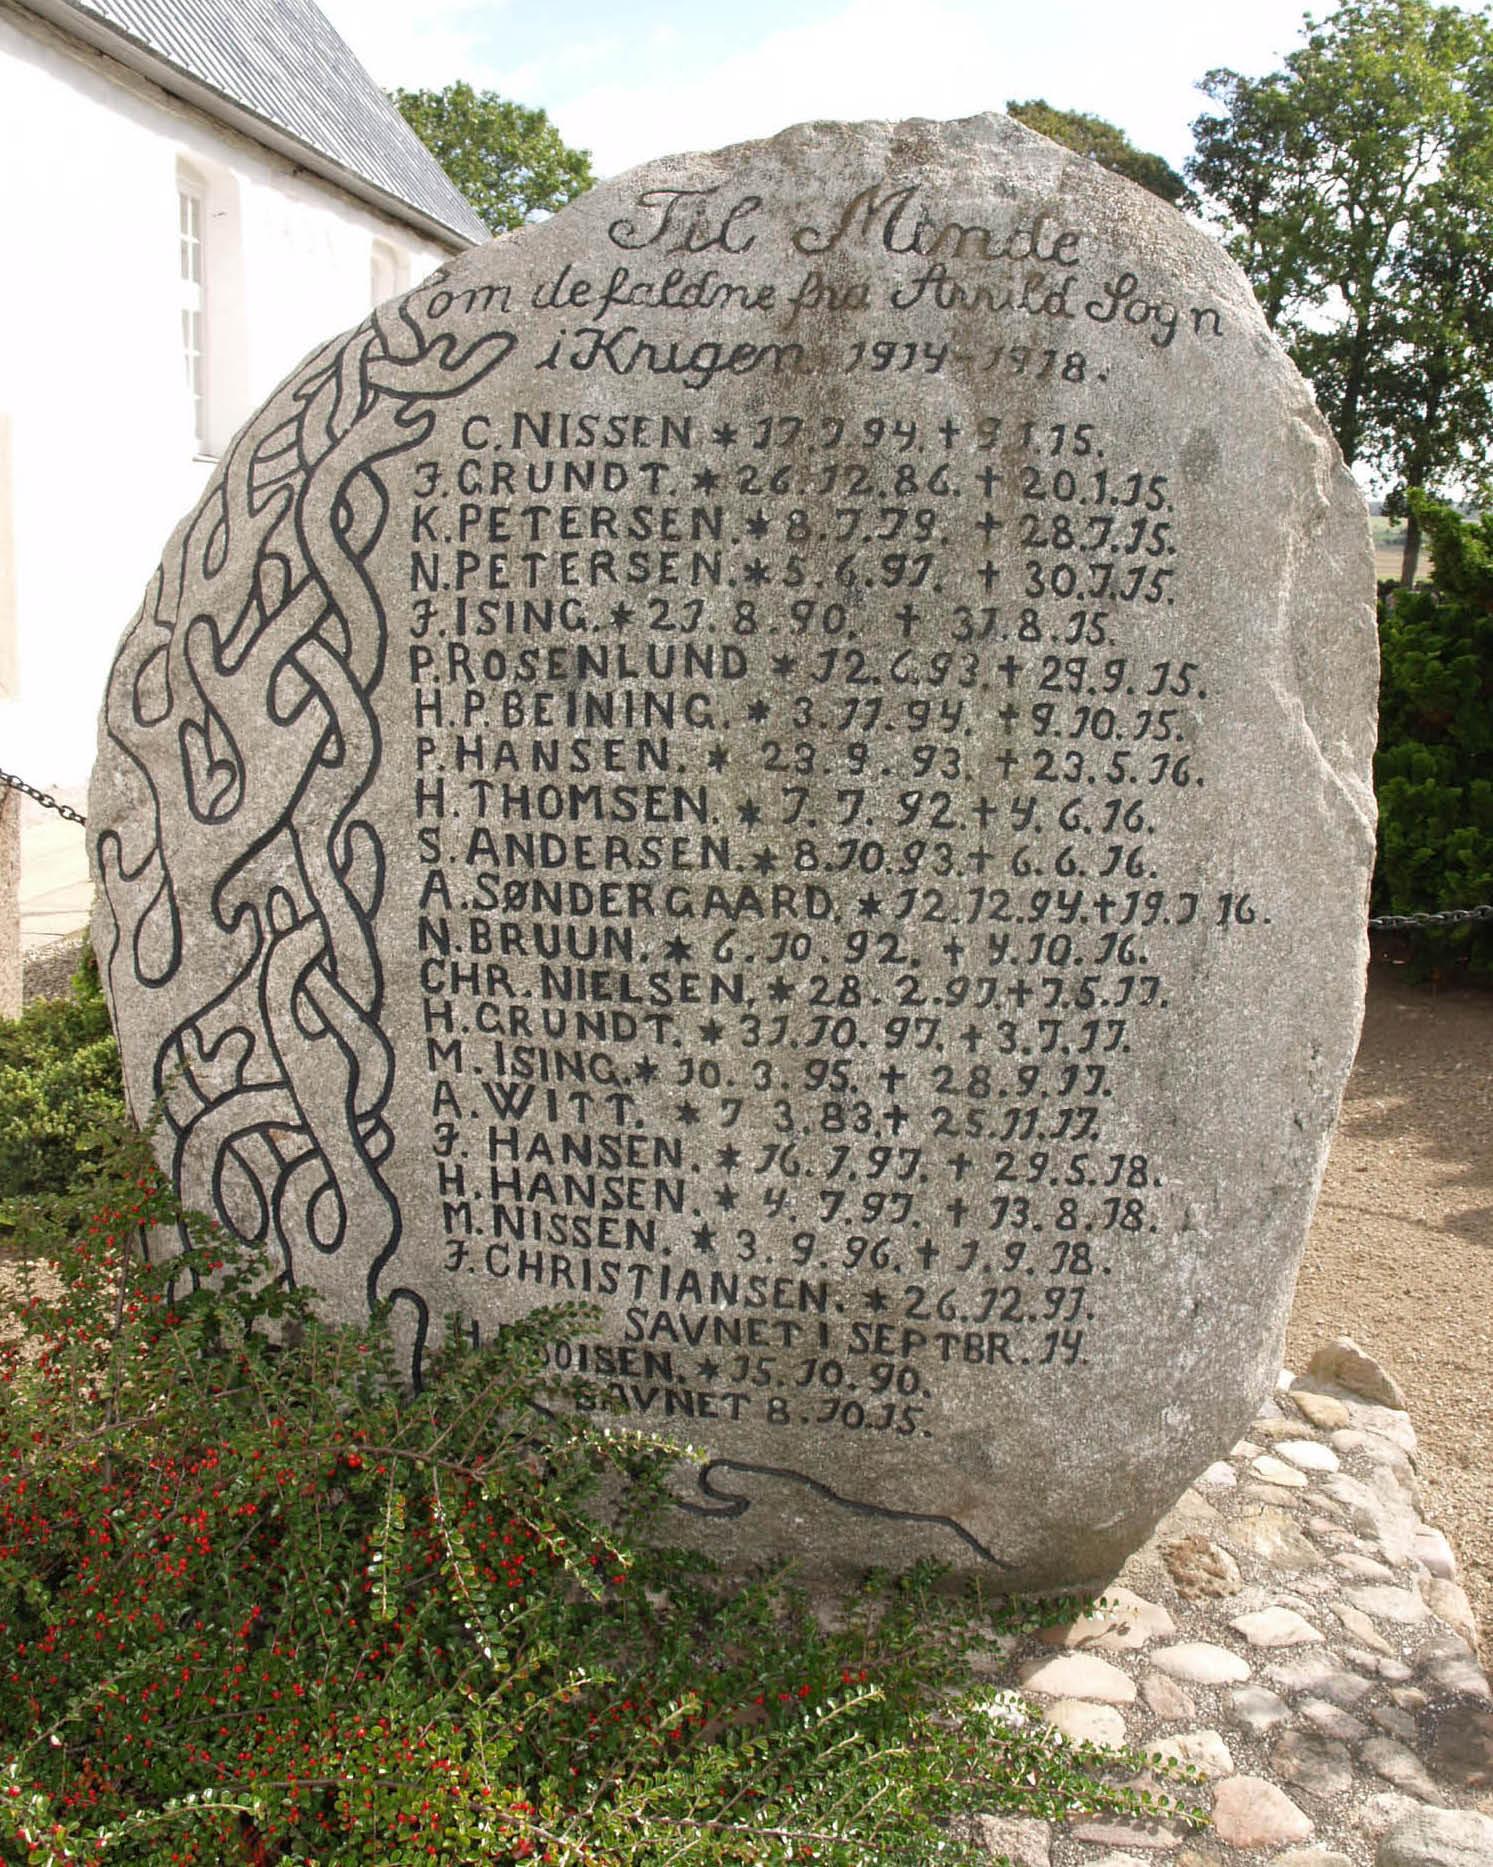 Mindesten, Arrild Kirkegård